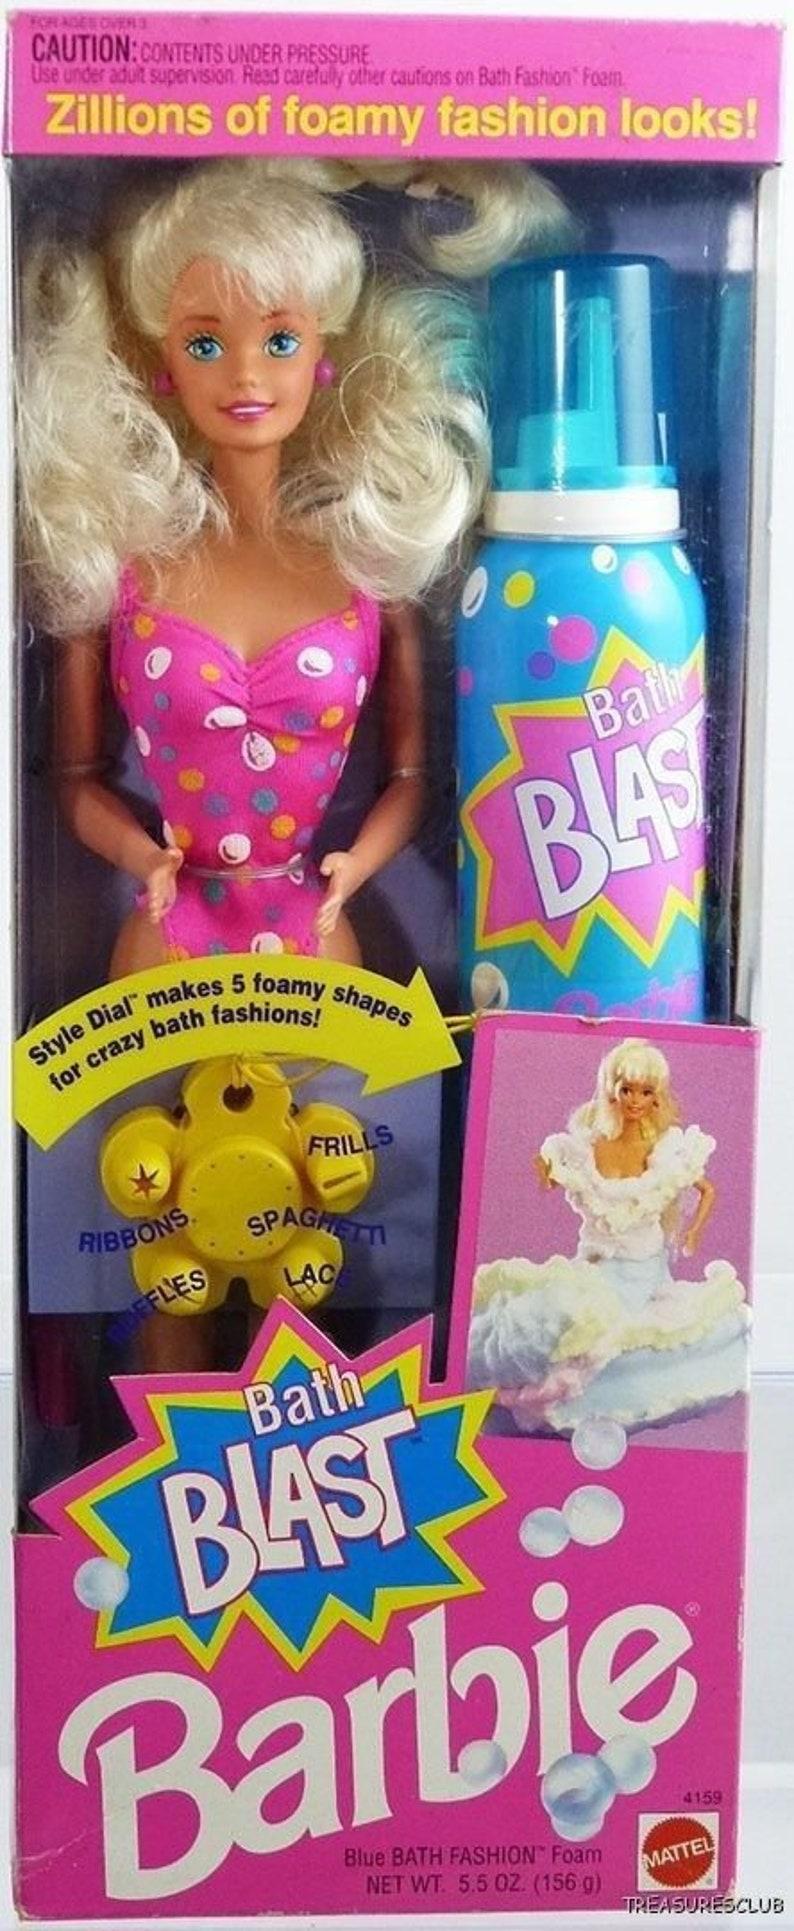 Salle de bain Blast Barbie Doll Vintage Barbie 1992 | Etsy